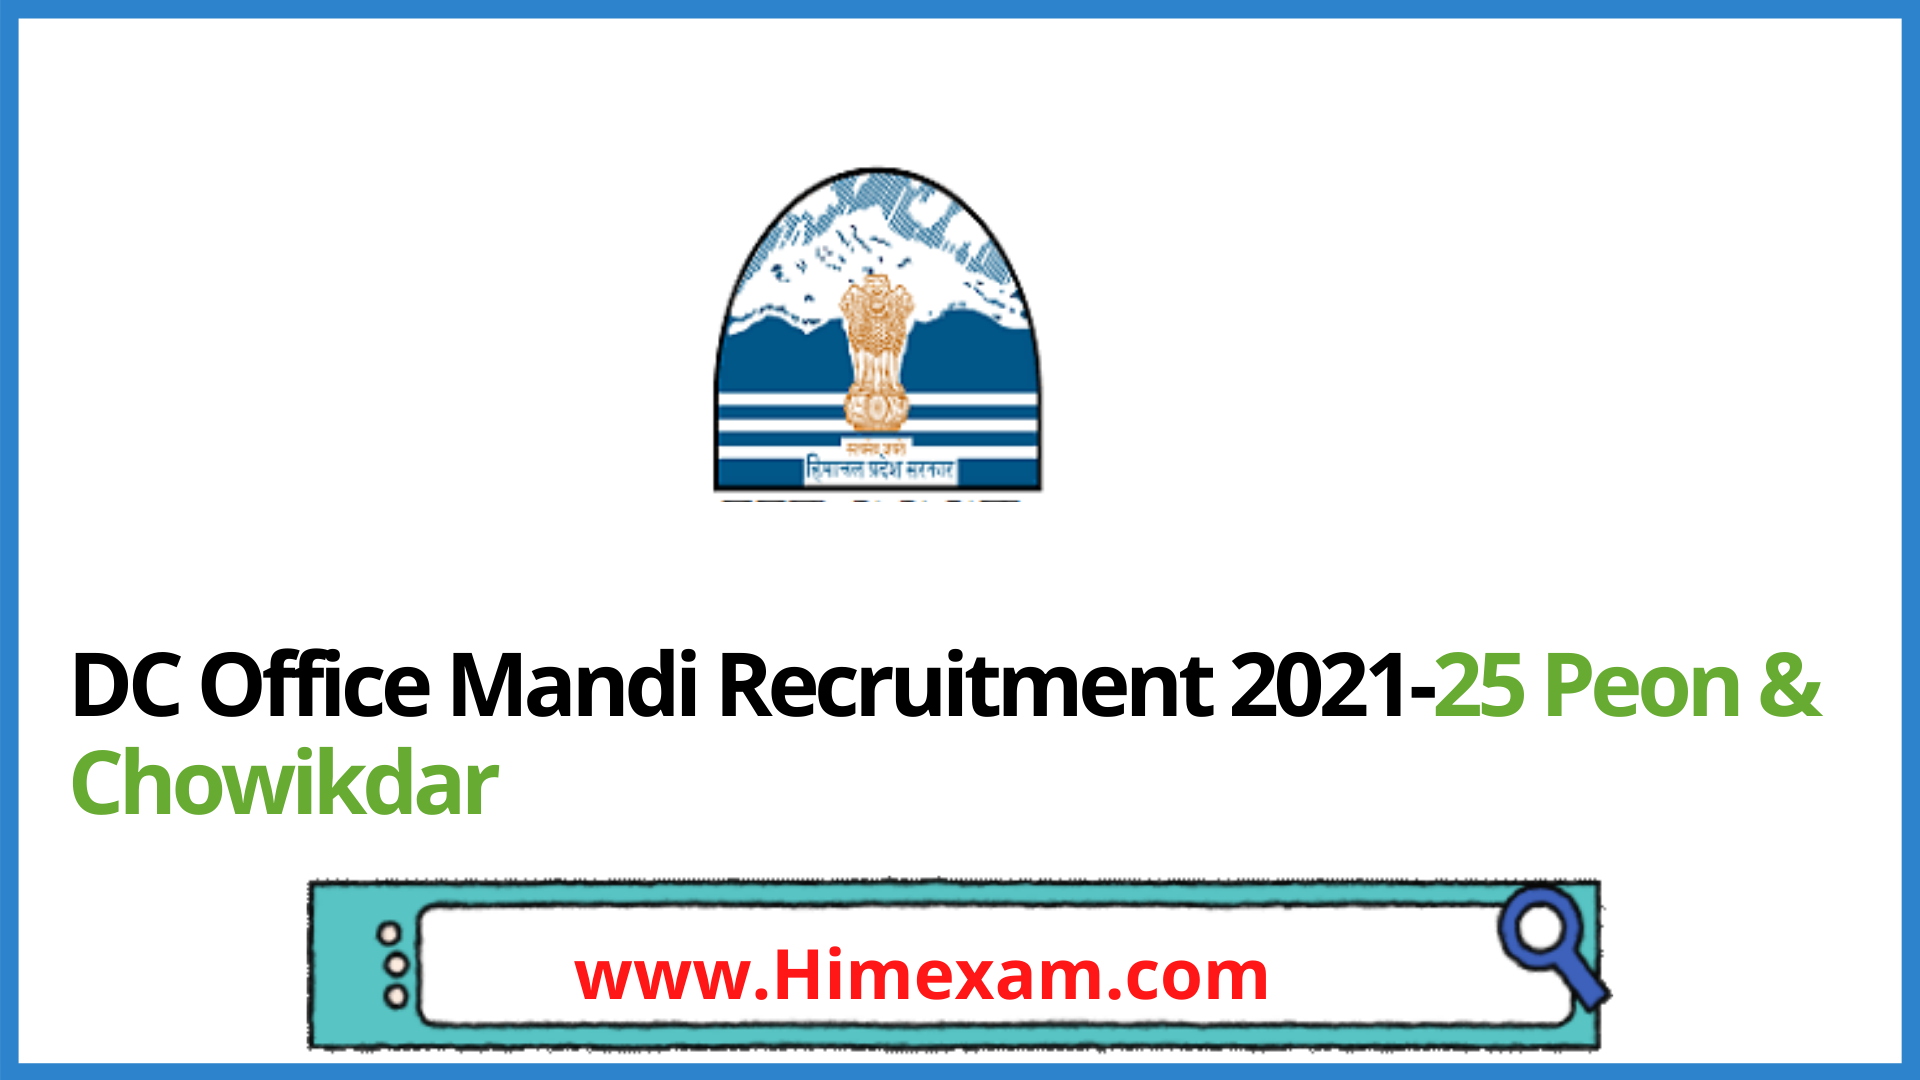 DC Office Mandi Recruitment 2021-25 Peon & Chowikdar